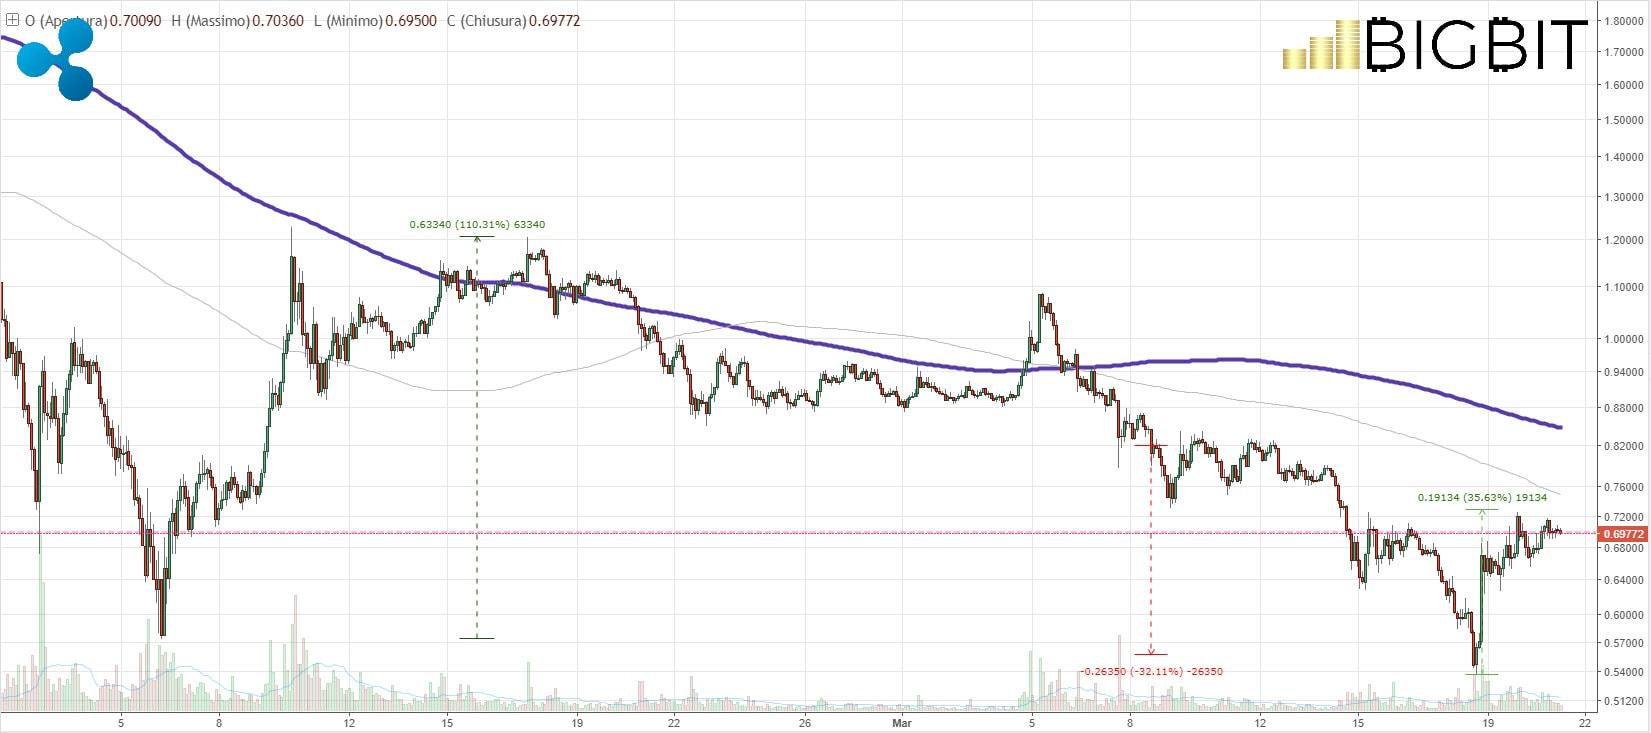 analisi prezzo ripple xrp 21 marzo 2018